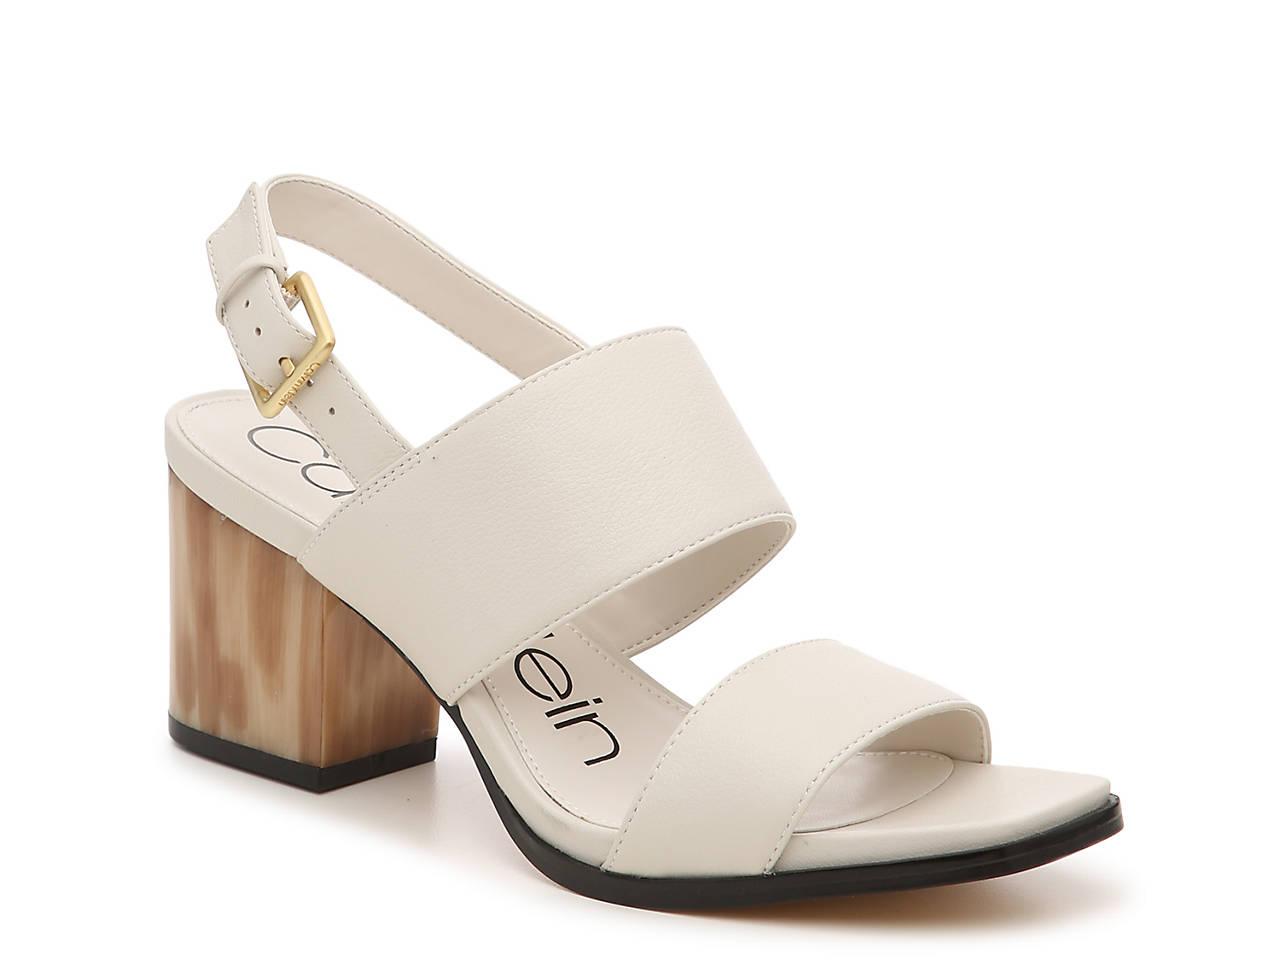 08048a45352 Calvin Klein Rosemary Crevo Sandal Women s Shoes